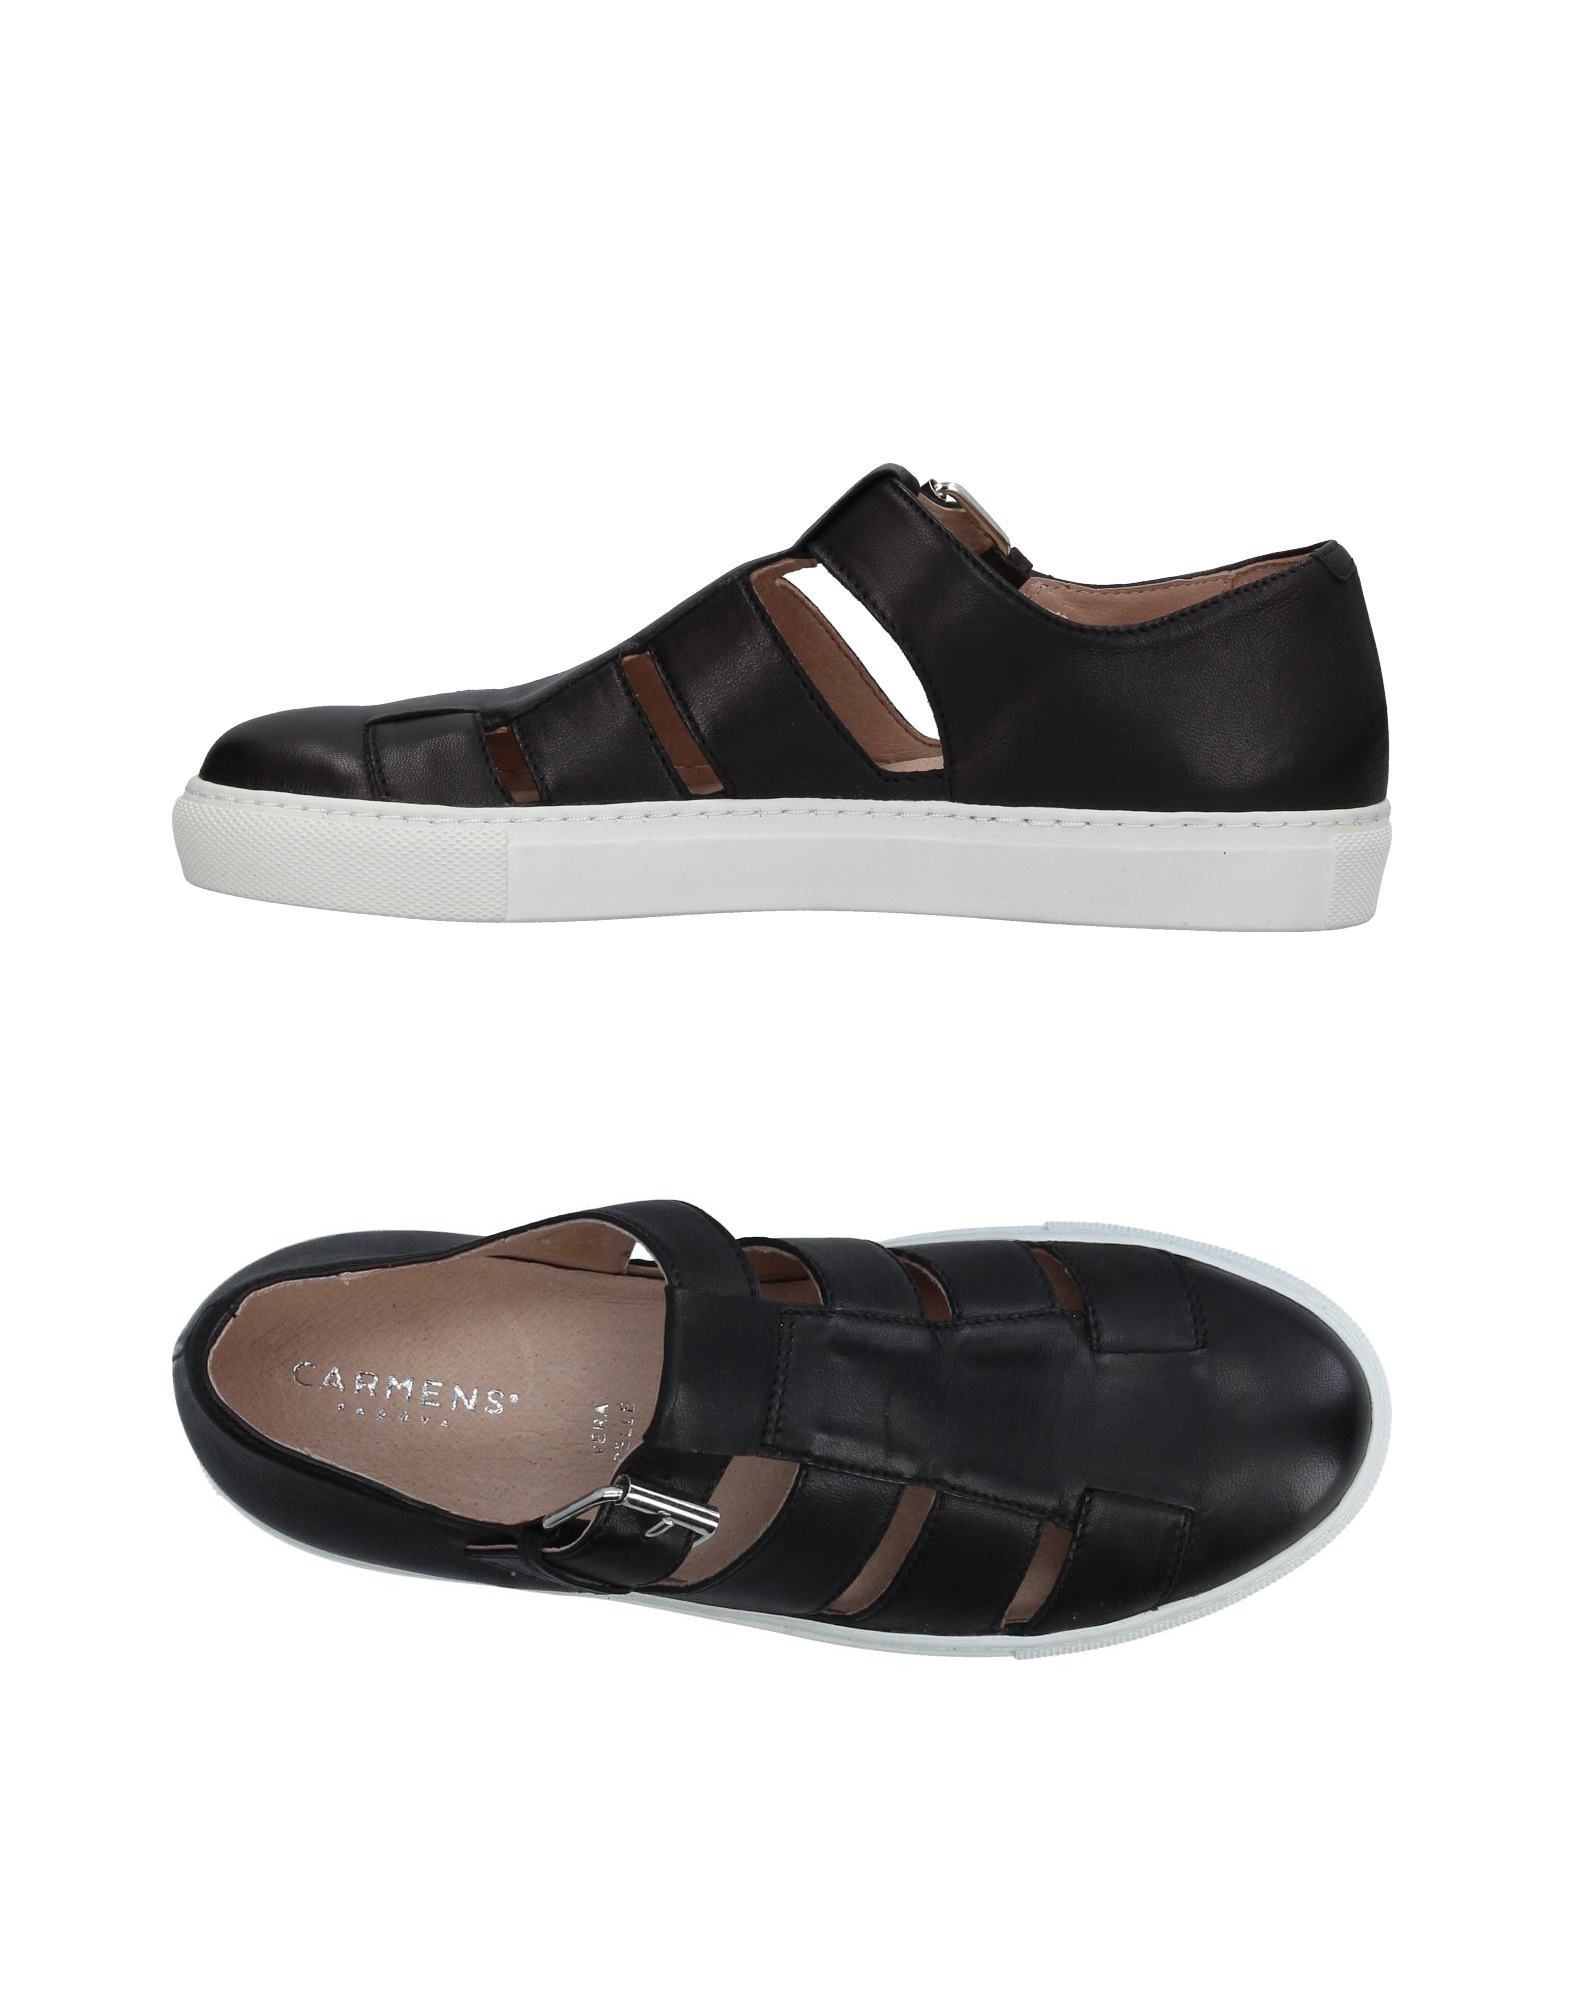 Moda Sneakers Carmens Donna Donna Carmens - 11371189VB fff607